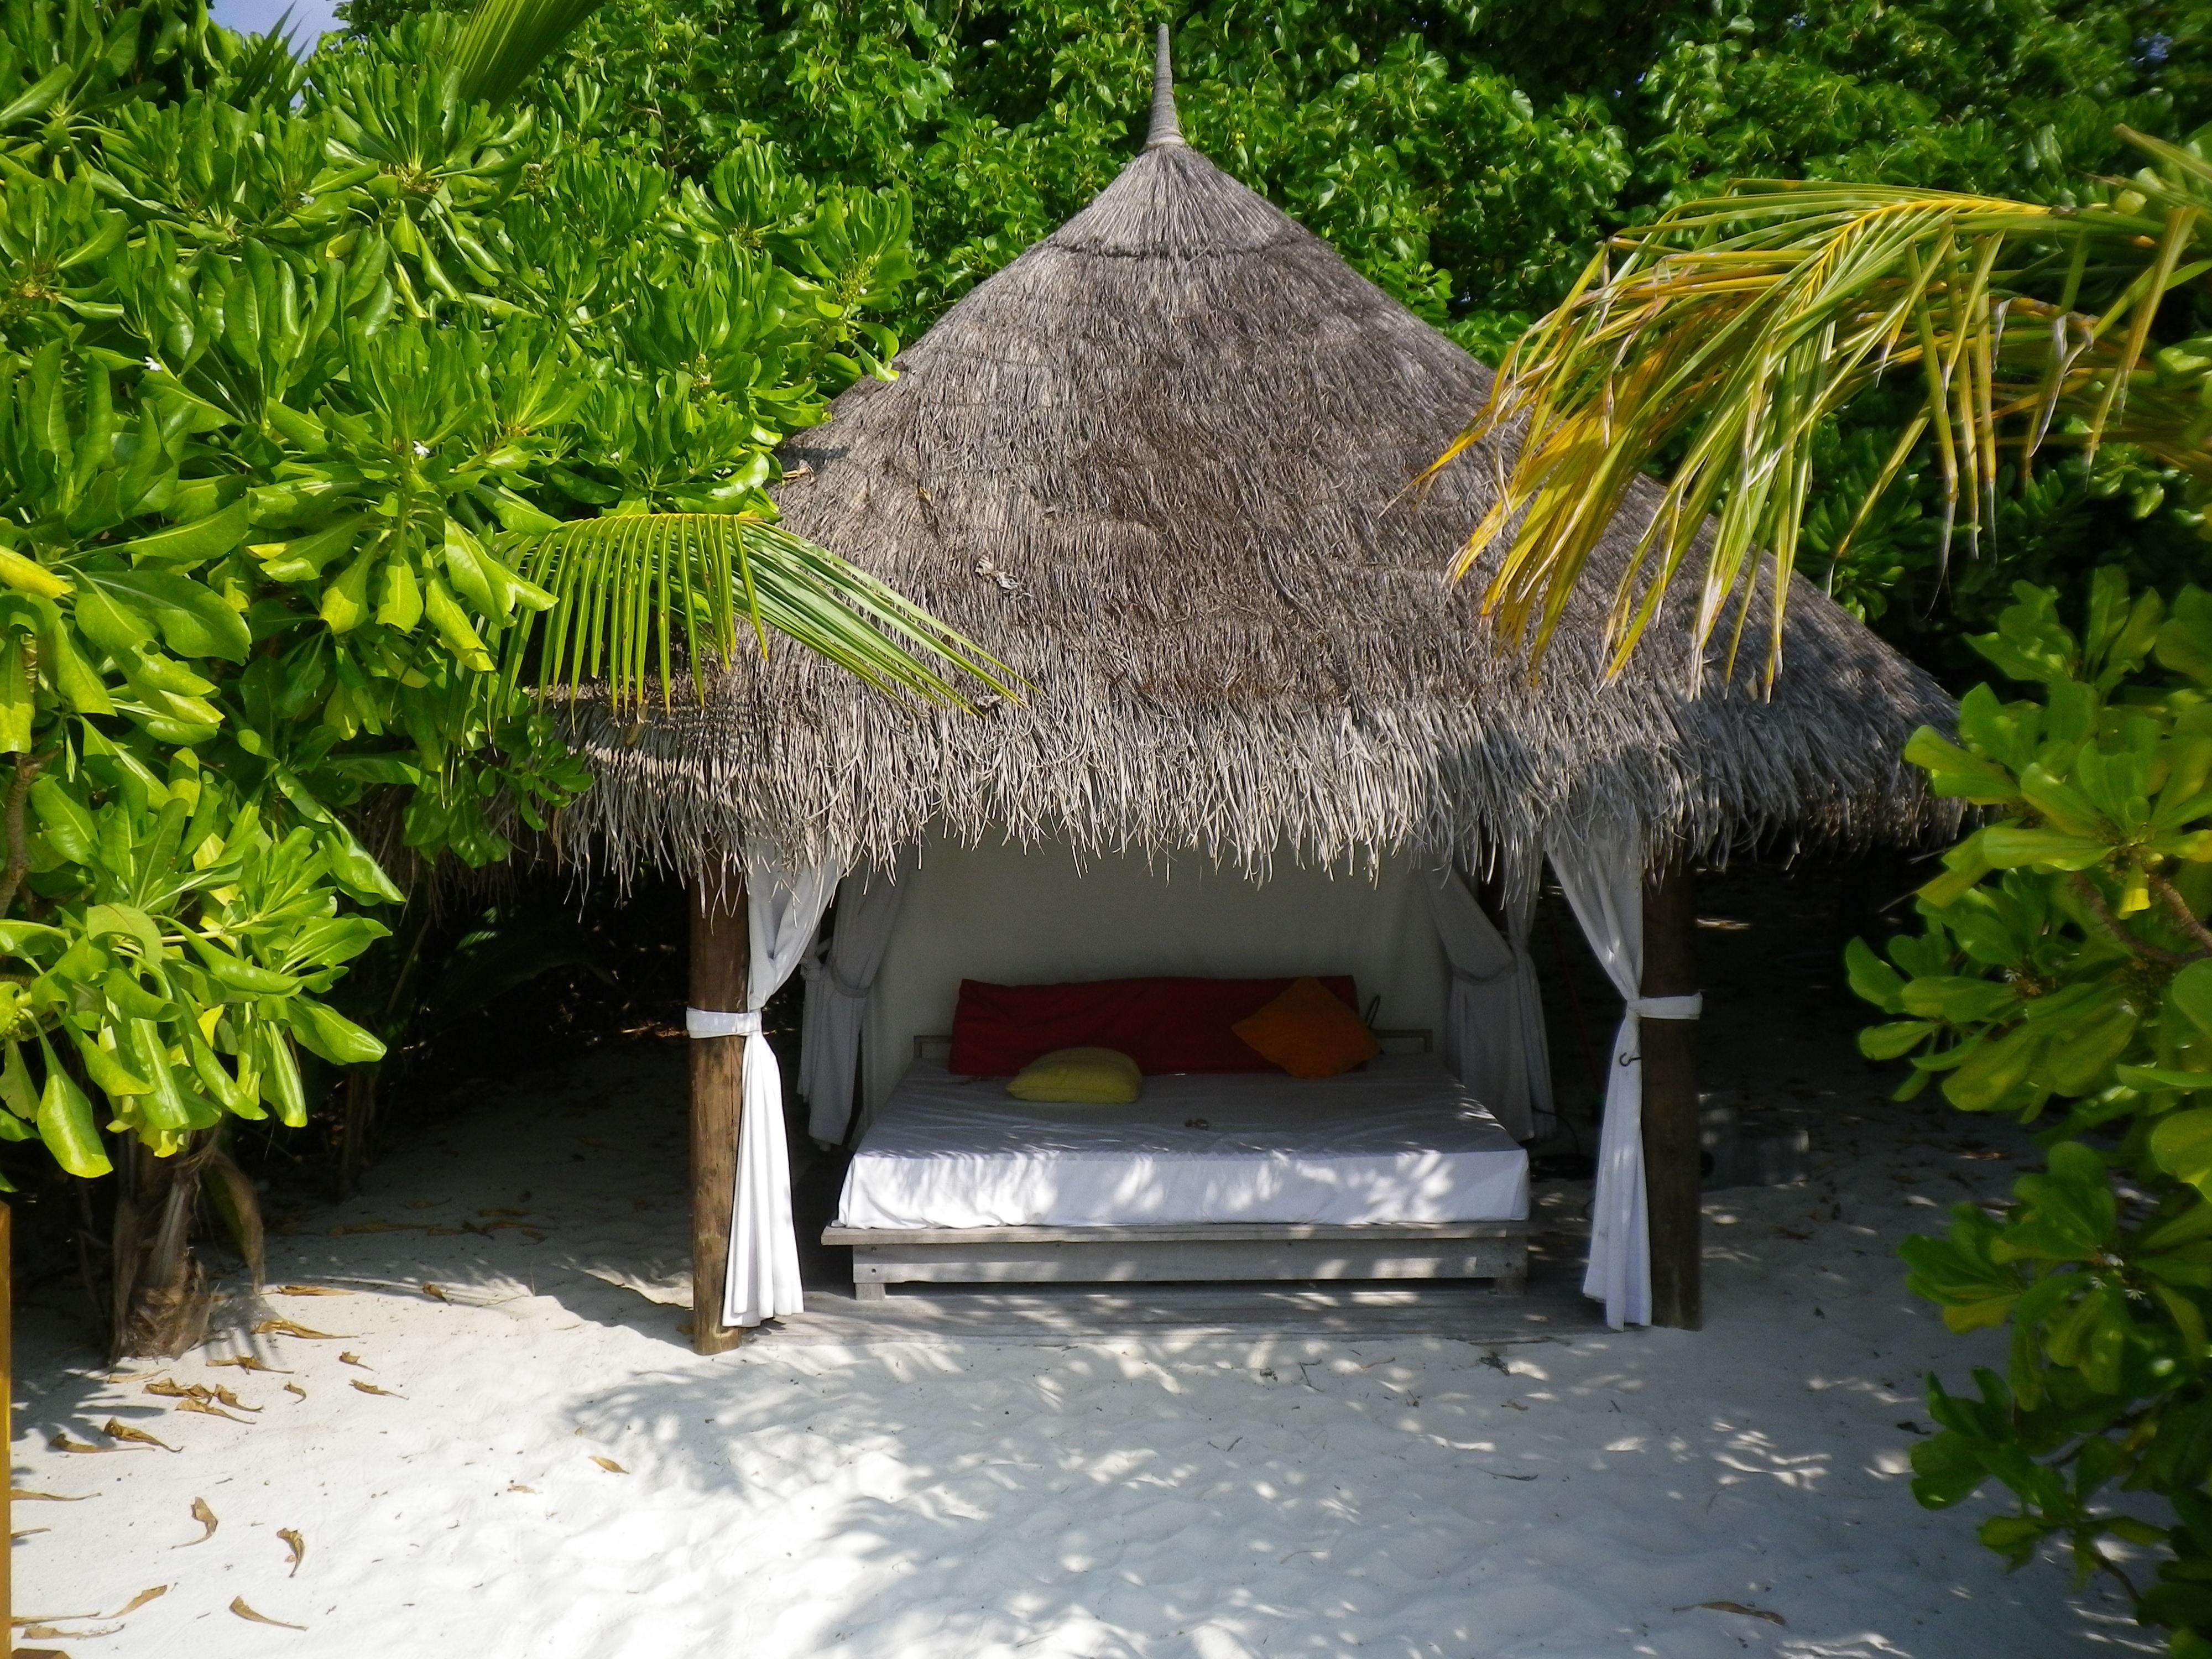 free images sand house hut jungle cottage backyard